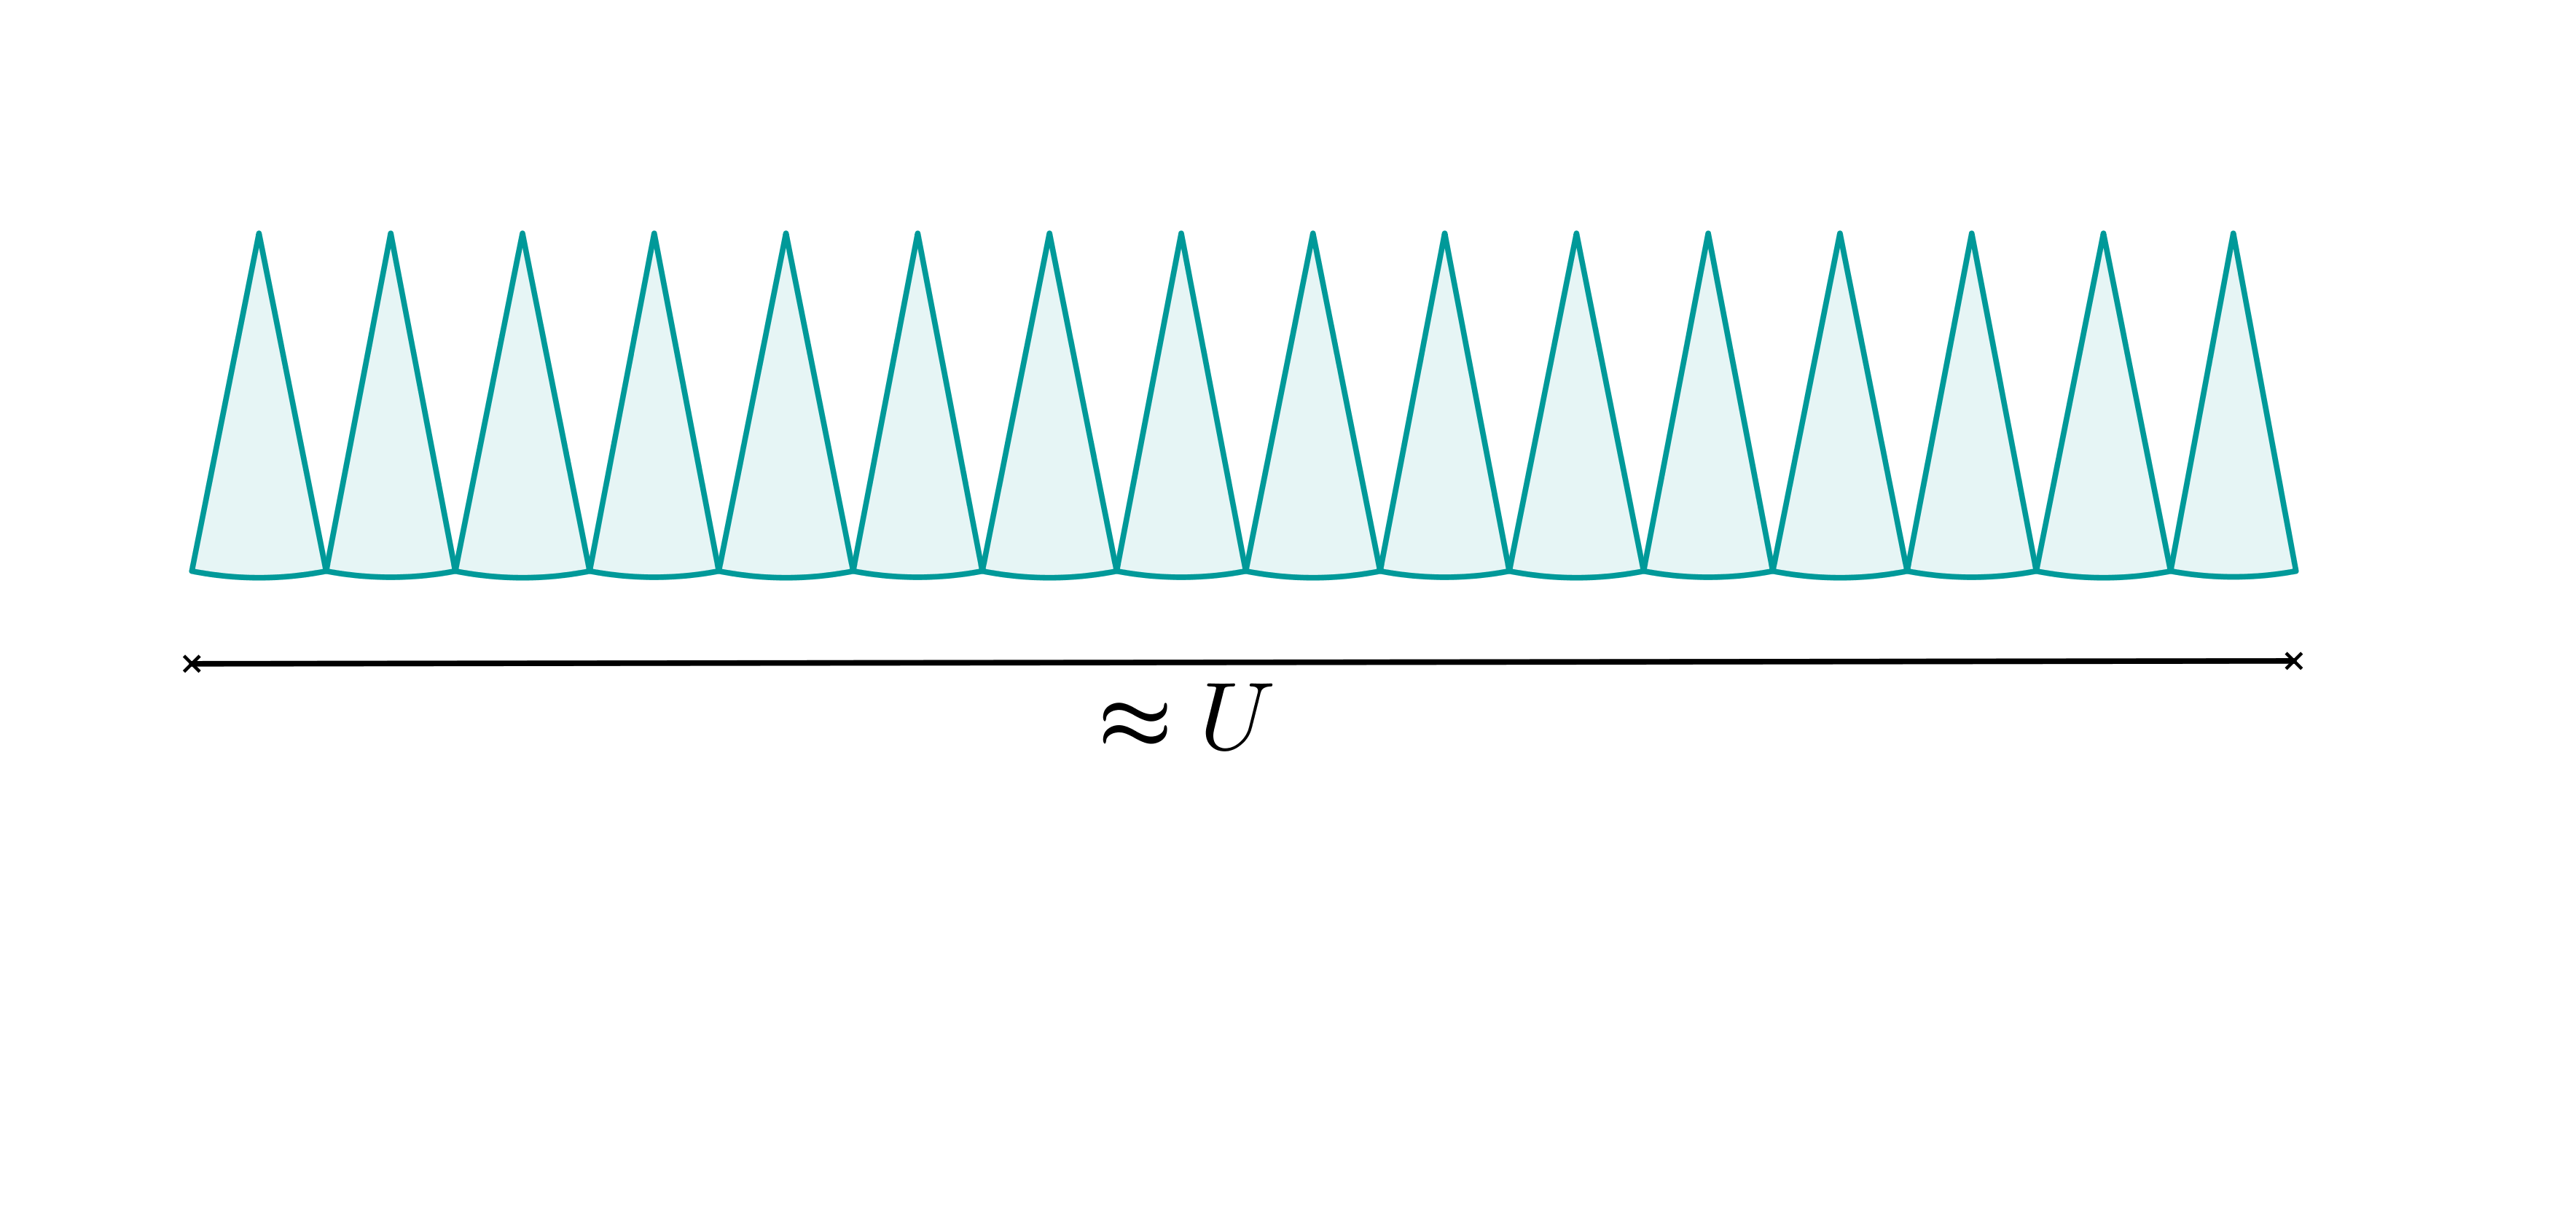 Berechnungen am Kreis » Serlo.org